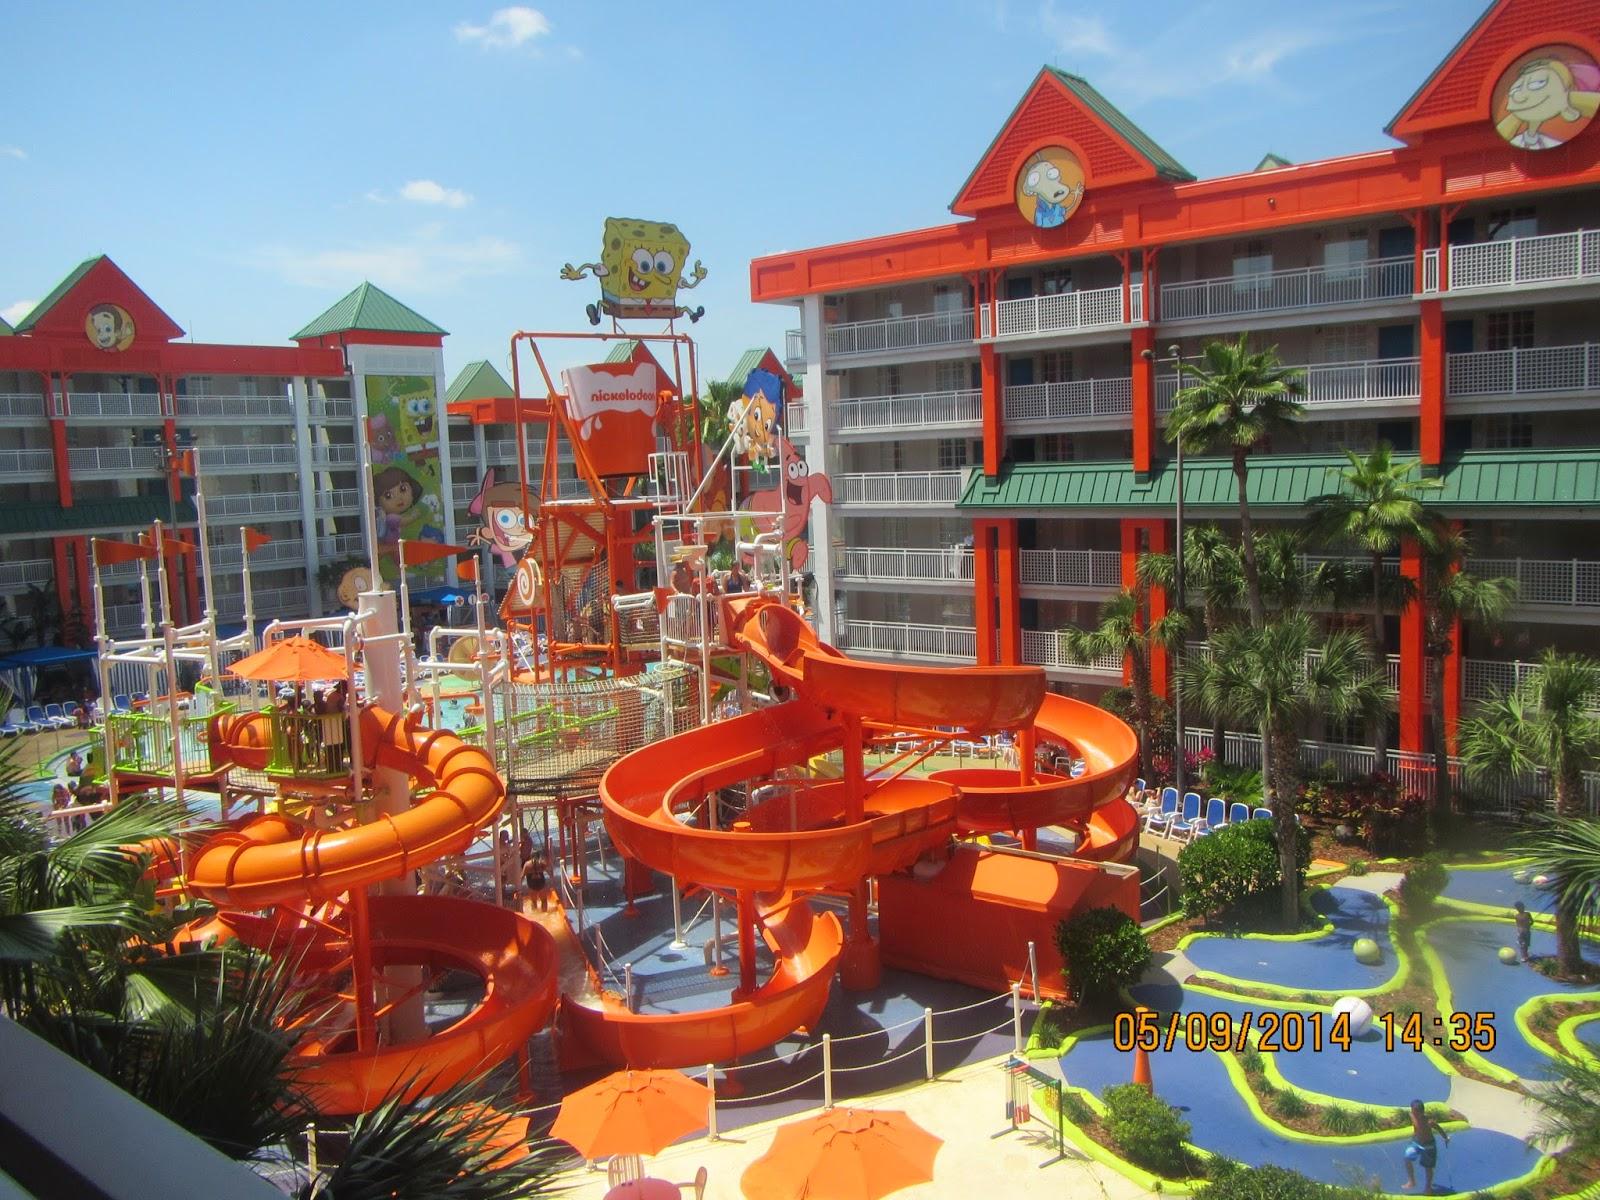 Orlando Inn Hotel